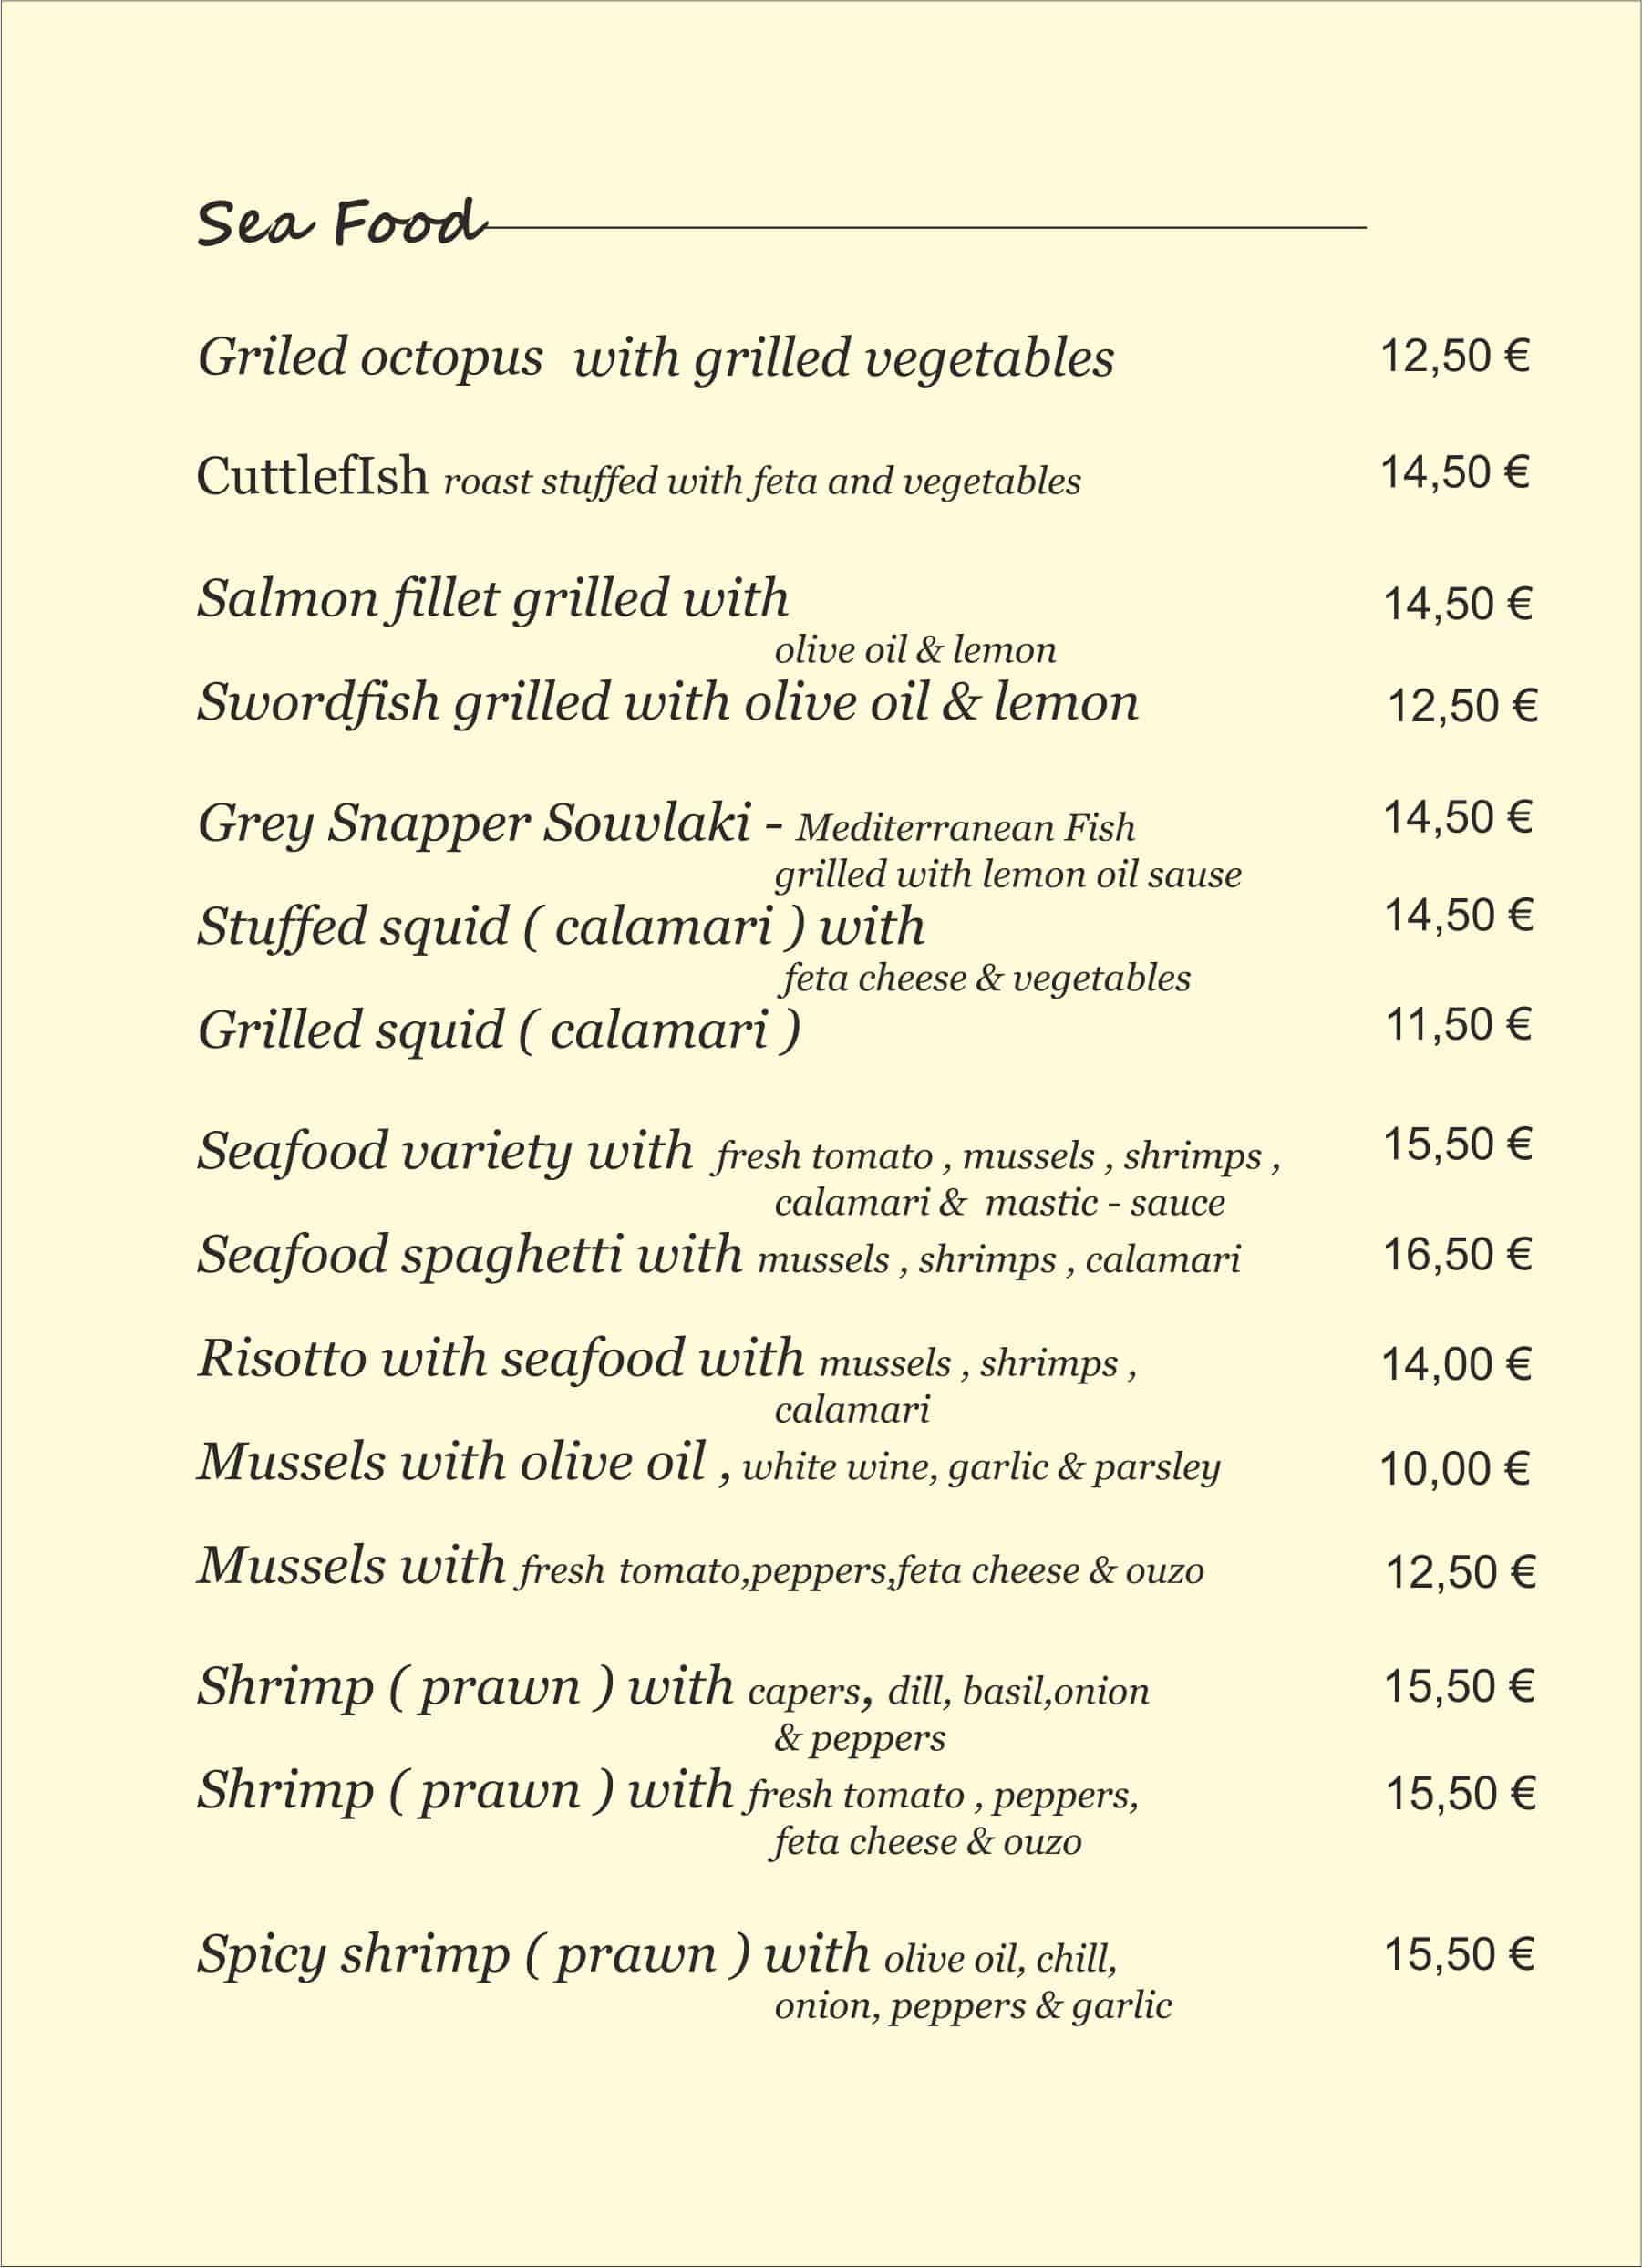 http://santorinikapari.gr/wp-content/uploads/2017/05/en-2017.seafood-1.jpg